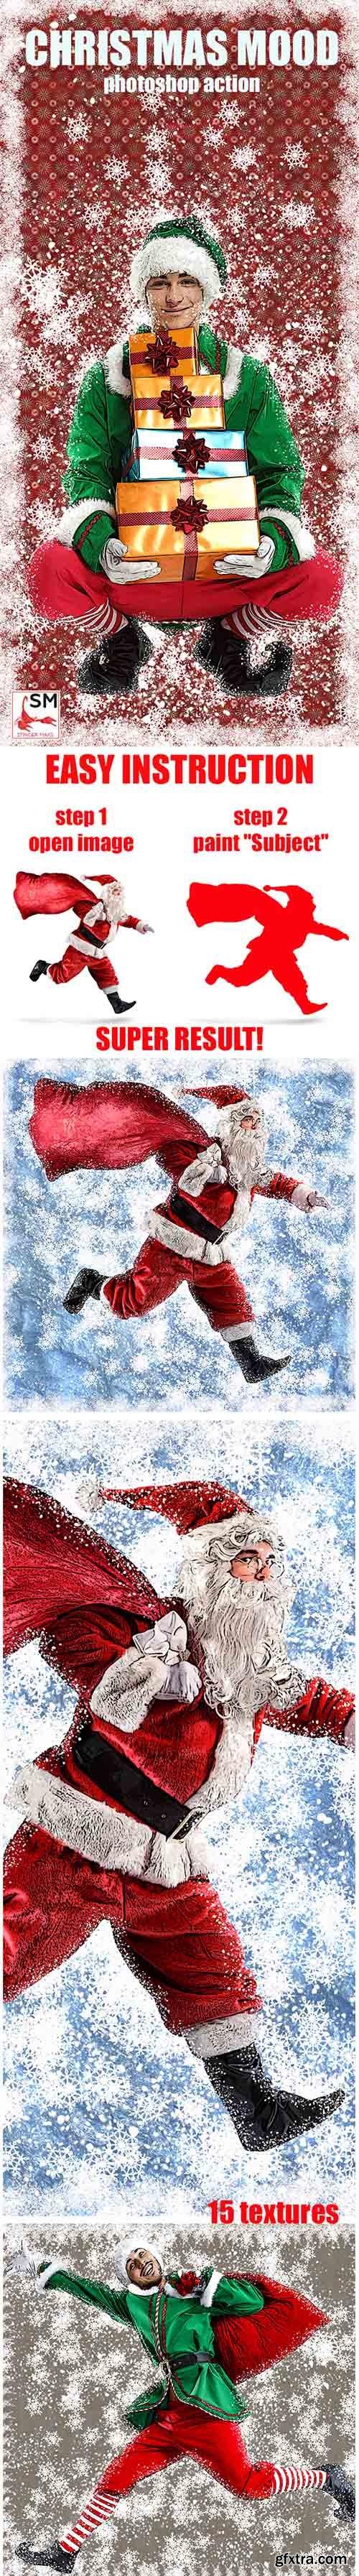 Graphicriver Christmas mood Photoshop Action 21080047